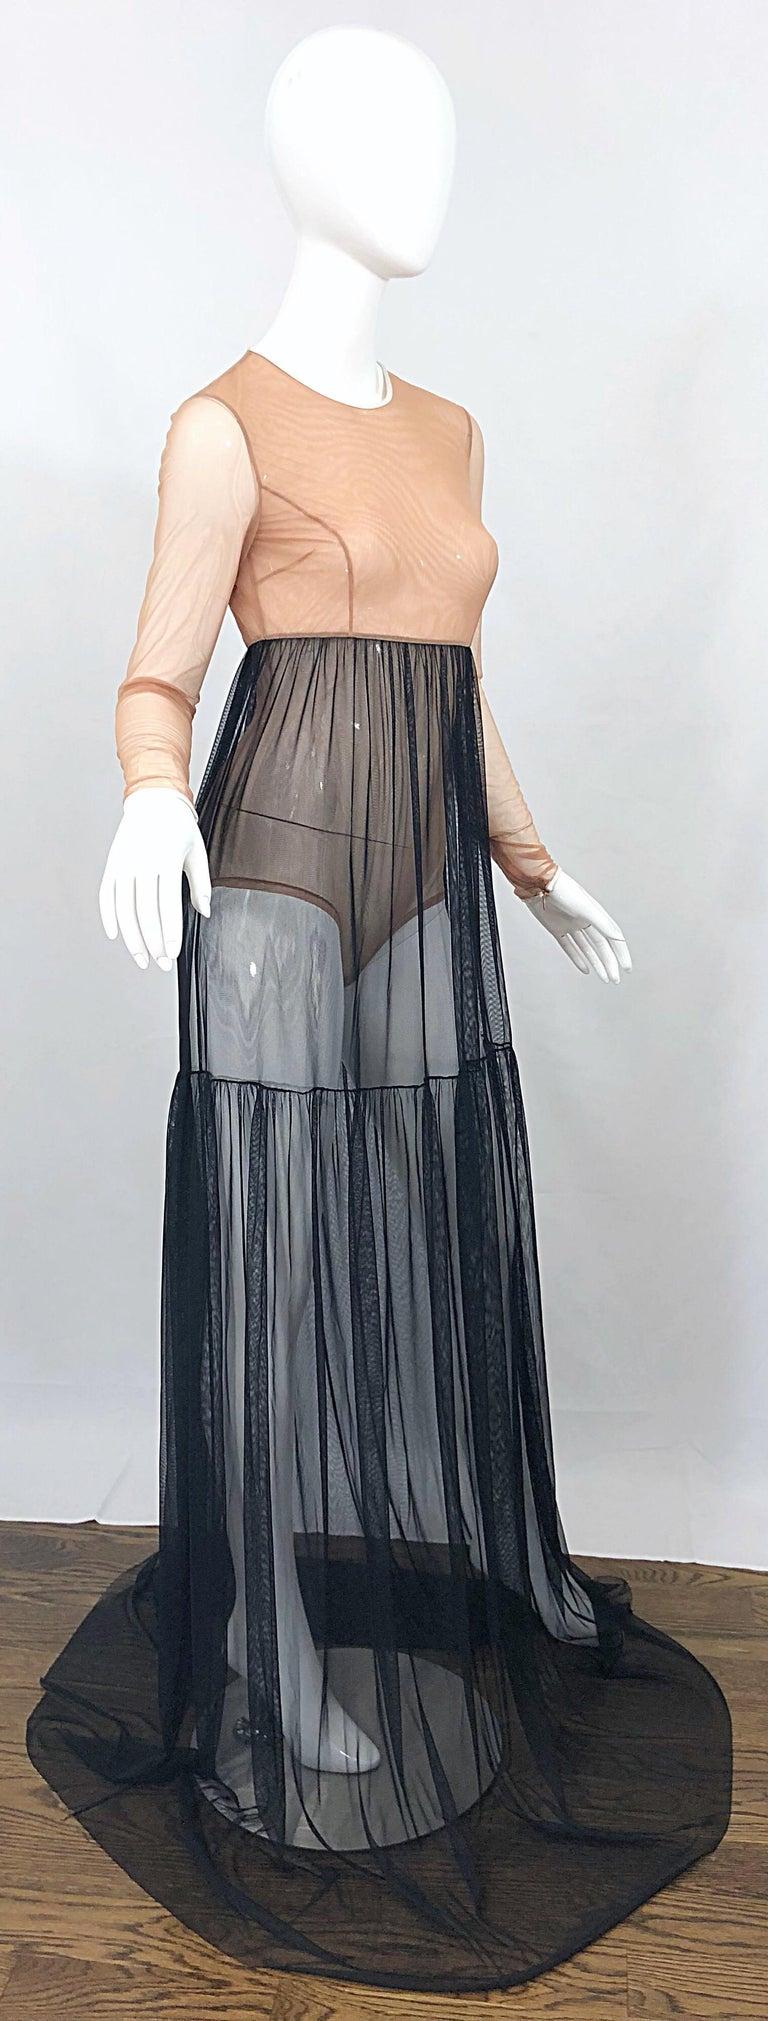 Michael Kors Collection Sz 4 Nude + Black Sheer Runway Mesh Bodysuit Gown Dress For Sale 6